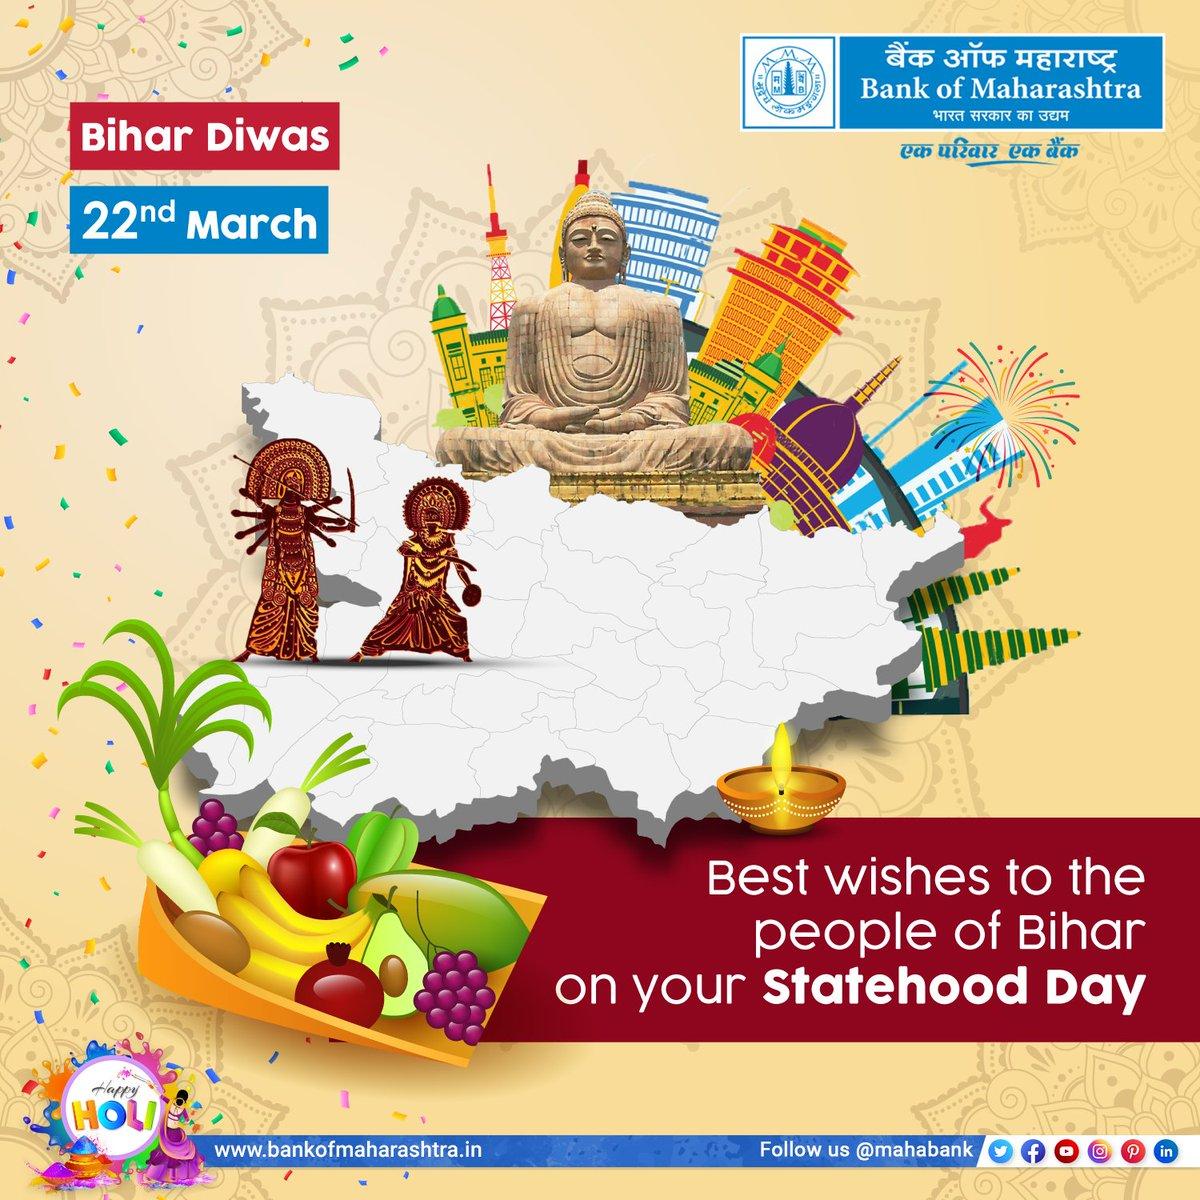 Best wishes to all the people of Bihar on your Statehood Day. Happy Bihardiwas BankofMaharashtra mahabank https t